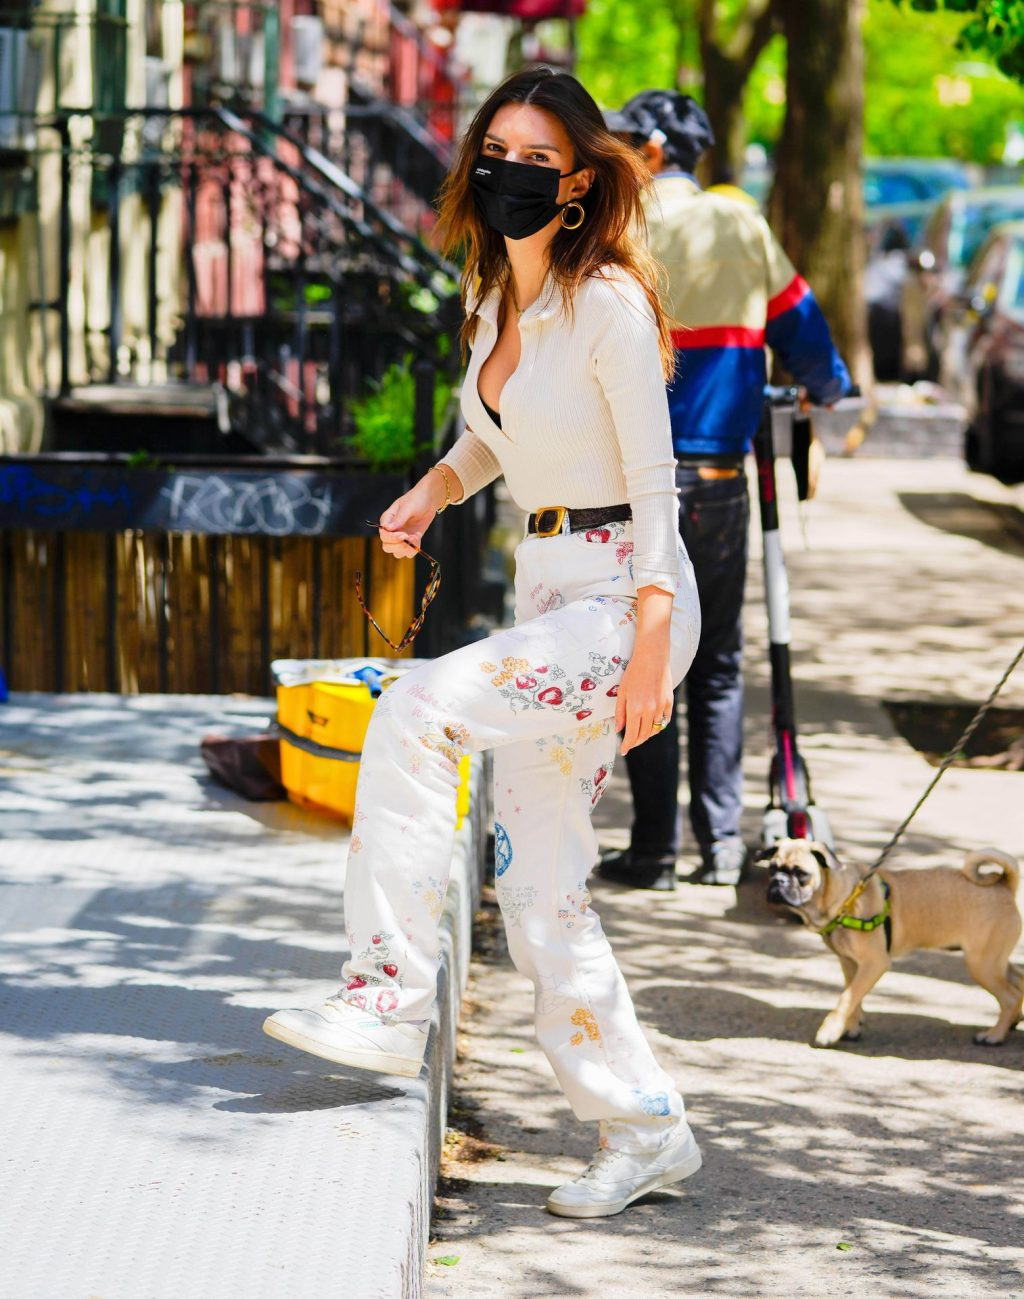 Emily Ratajkowski Flaunts Her Cleavage in NYC (15 Photos)